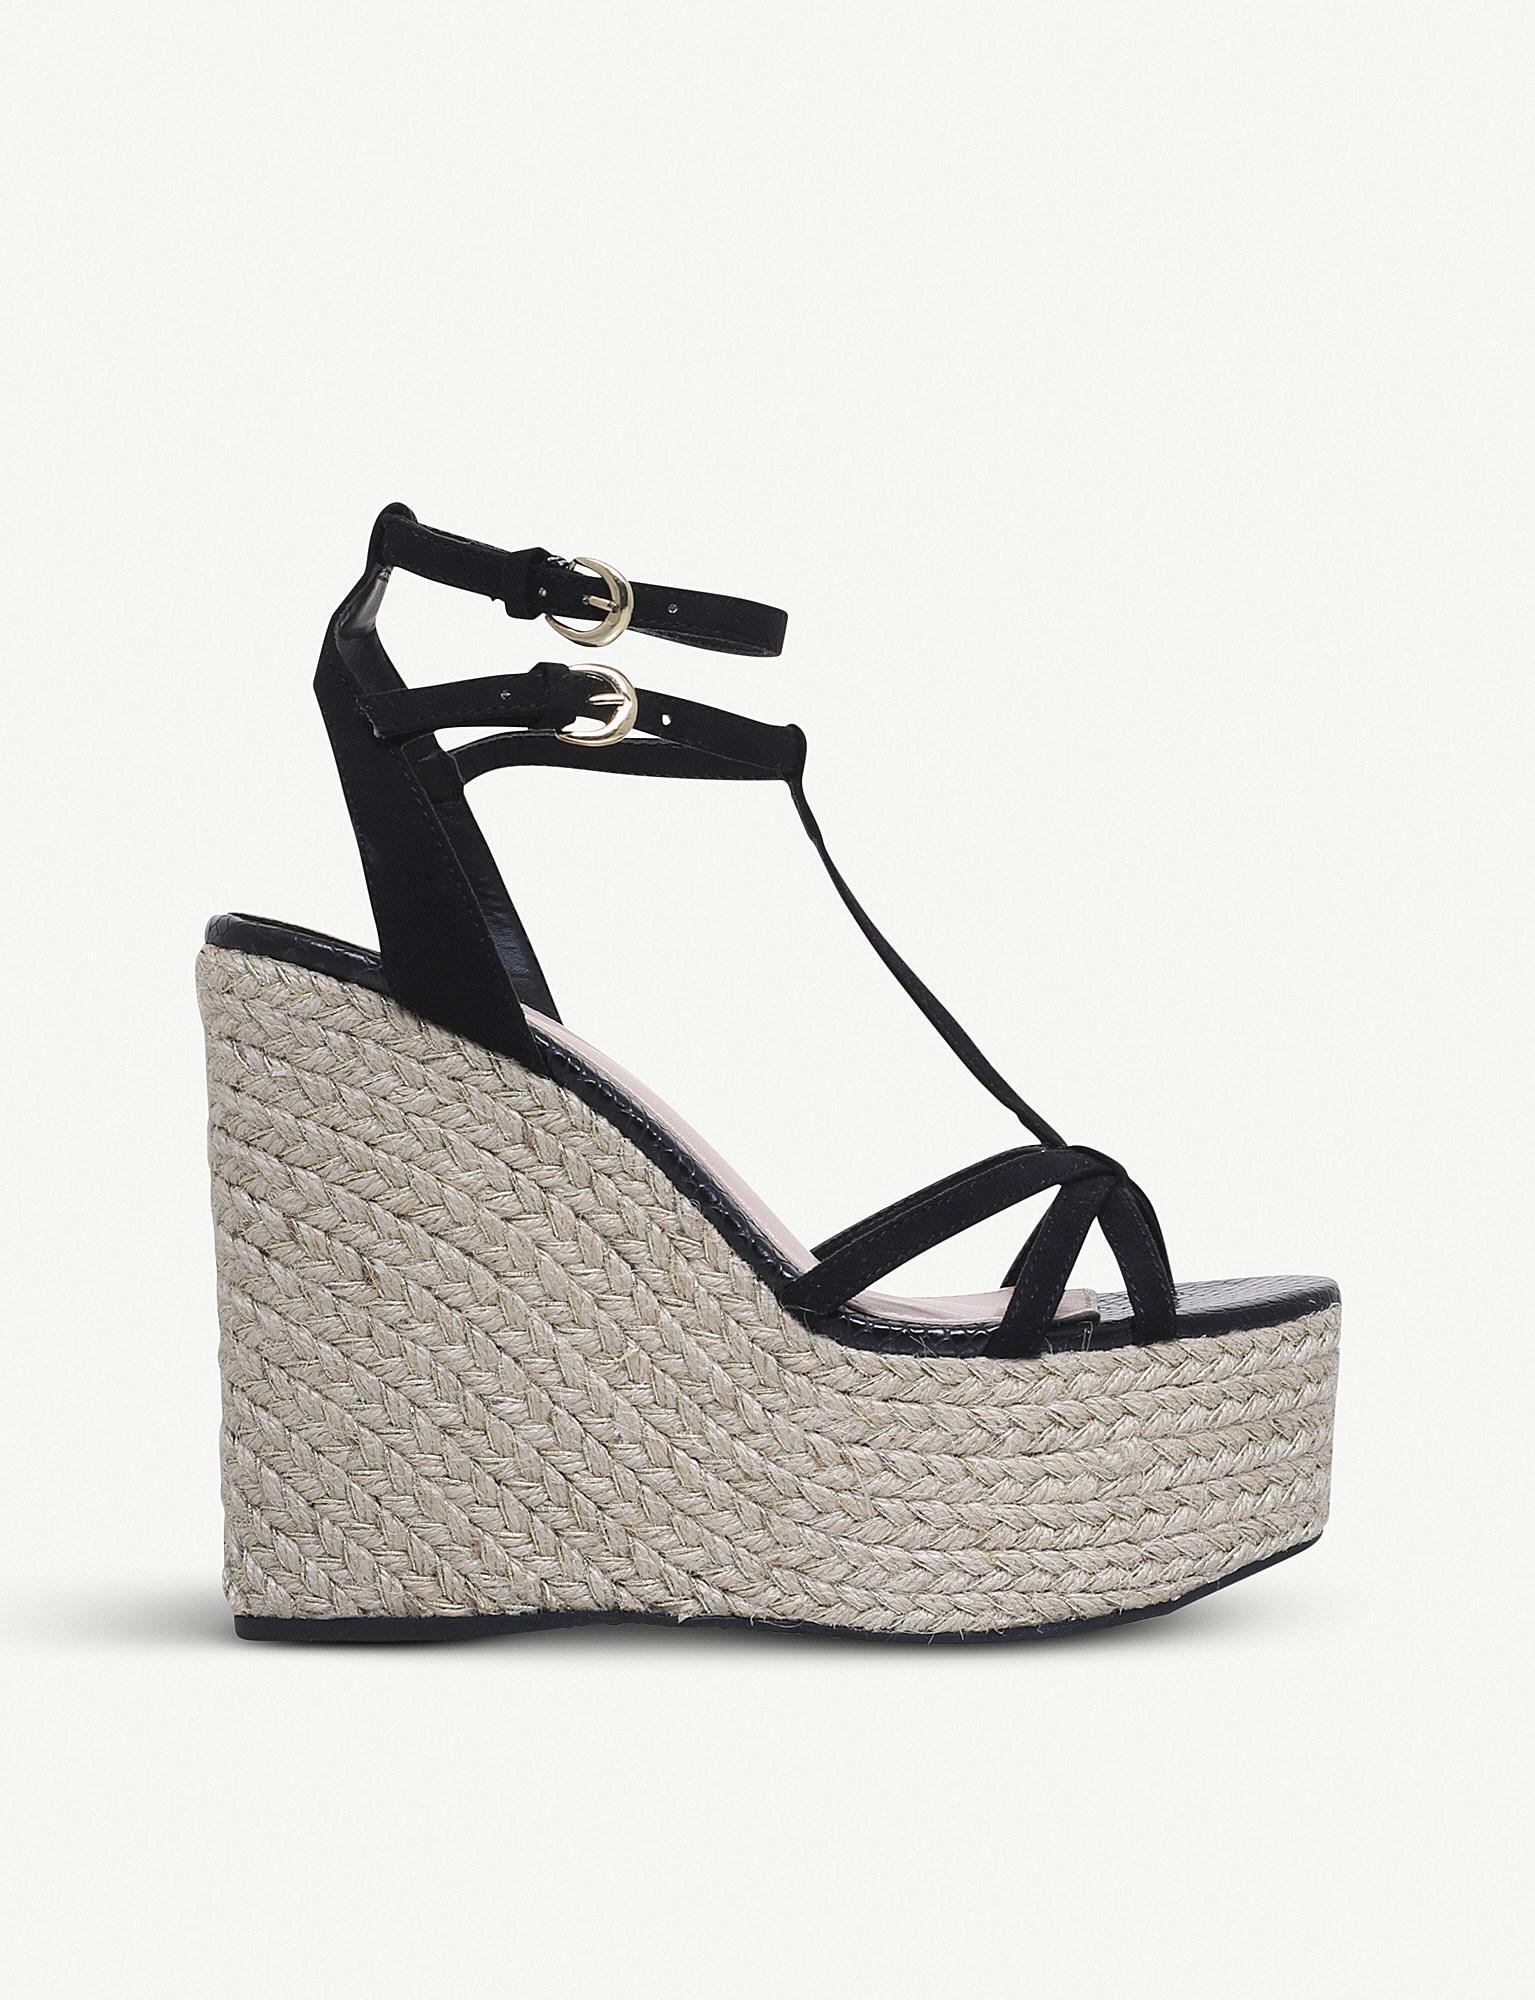 9b159cd8e7f Lyst - Miss Kg Pamela Faux-suede Wedged Sandals in Black